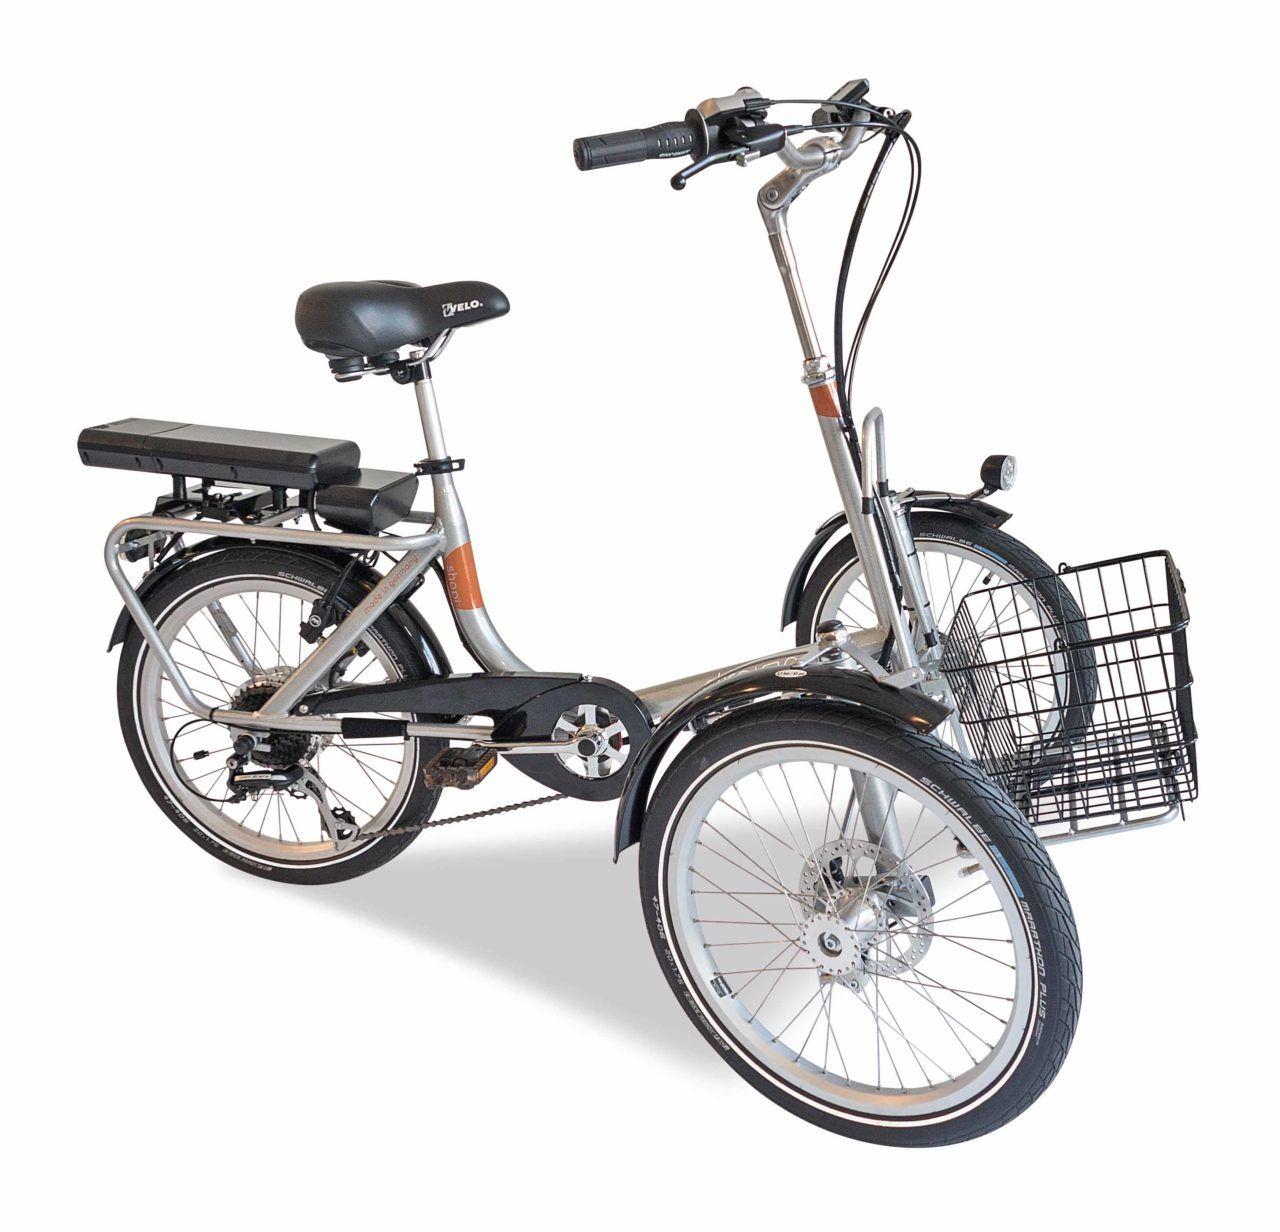 Faltbares Dreirad Fur Erwachsene Shopi Shopping Dreirad Fur Senioren